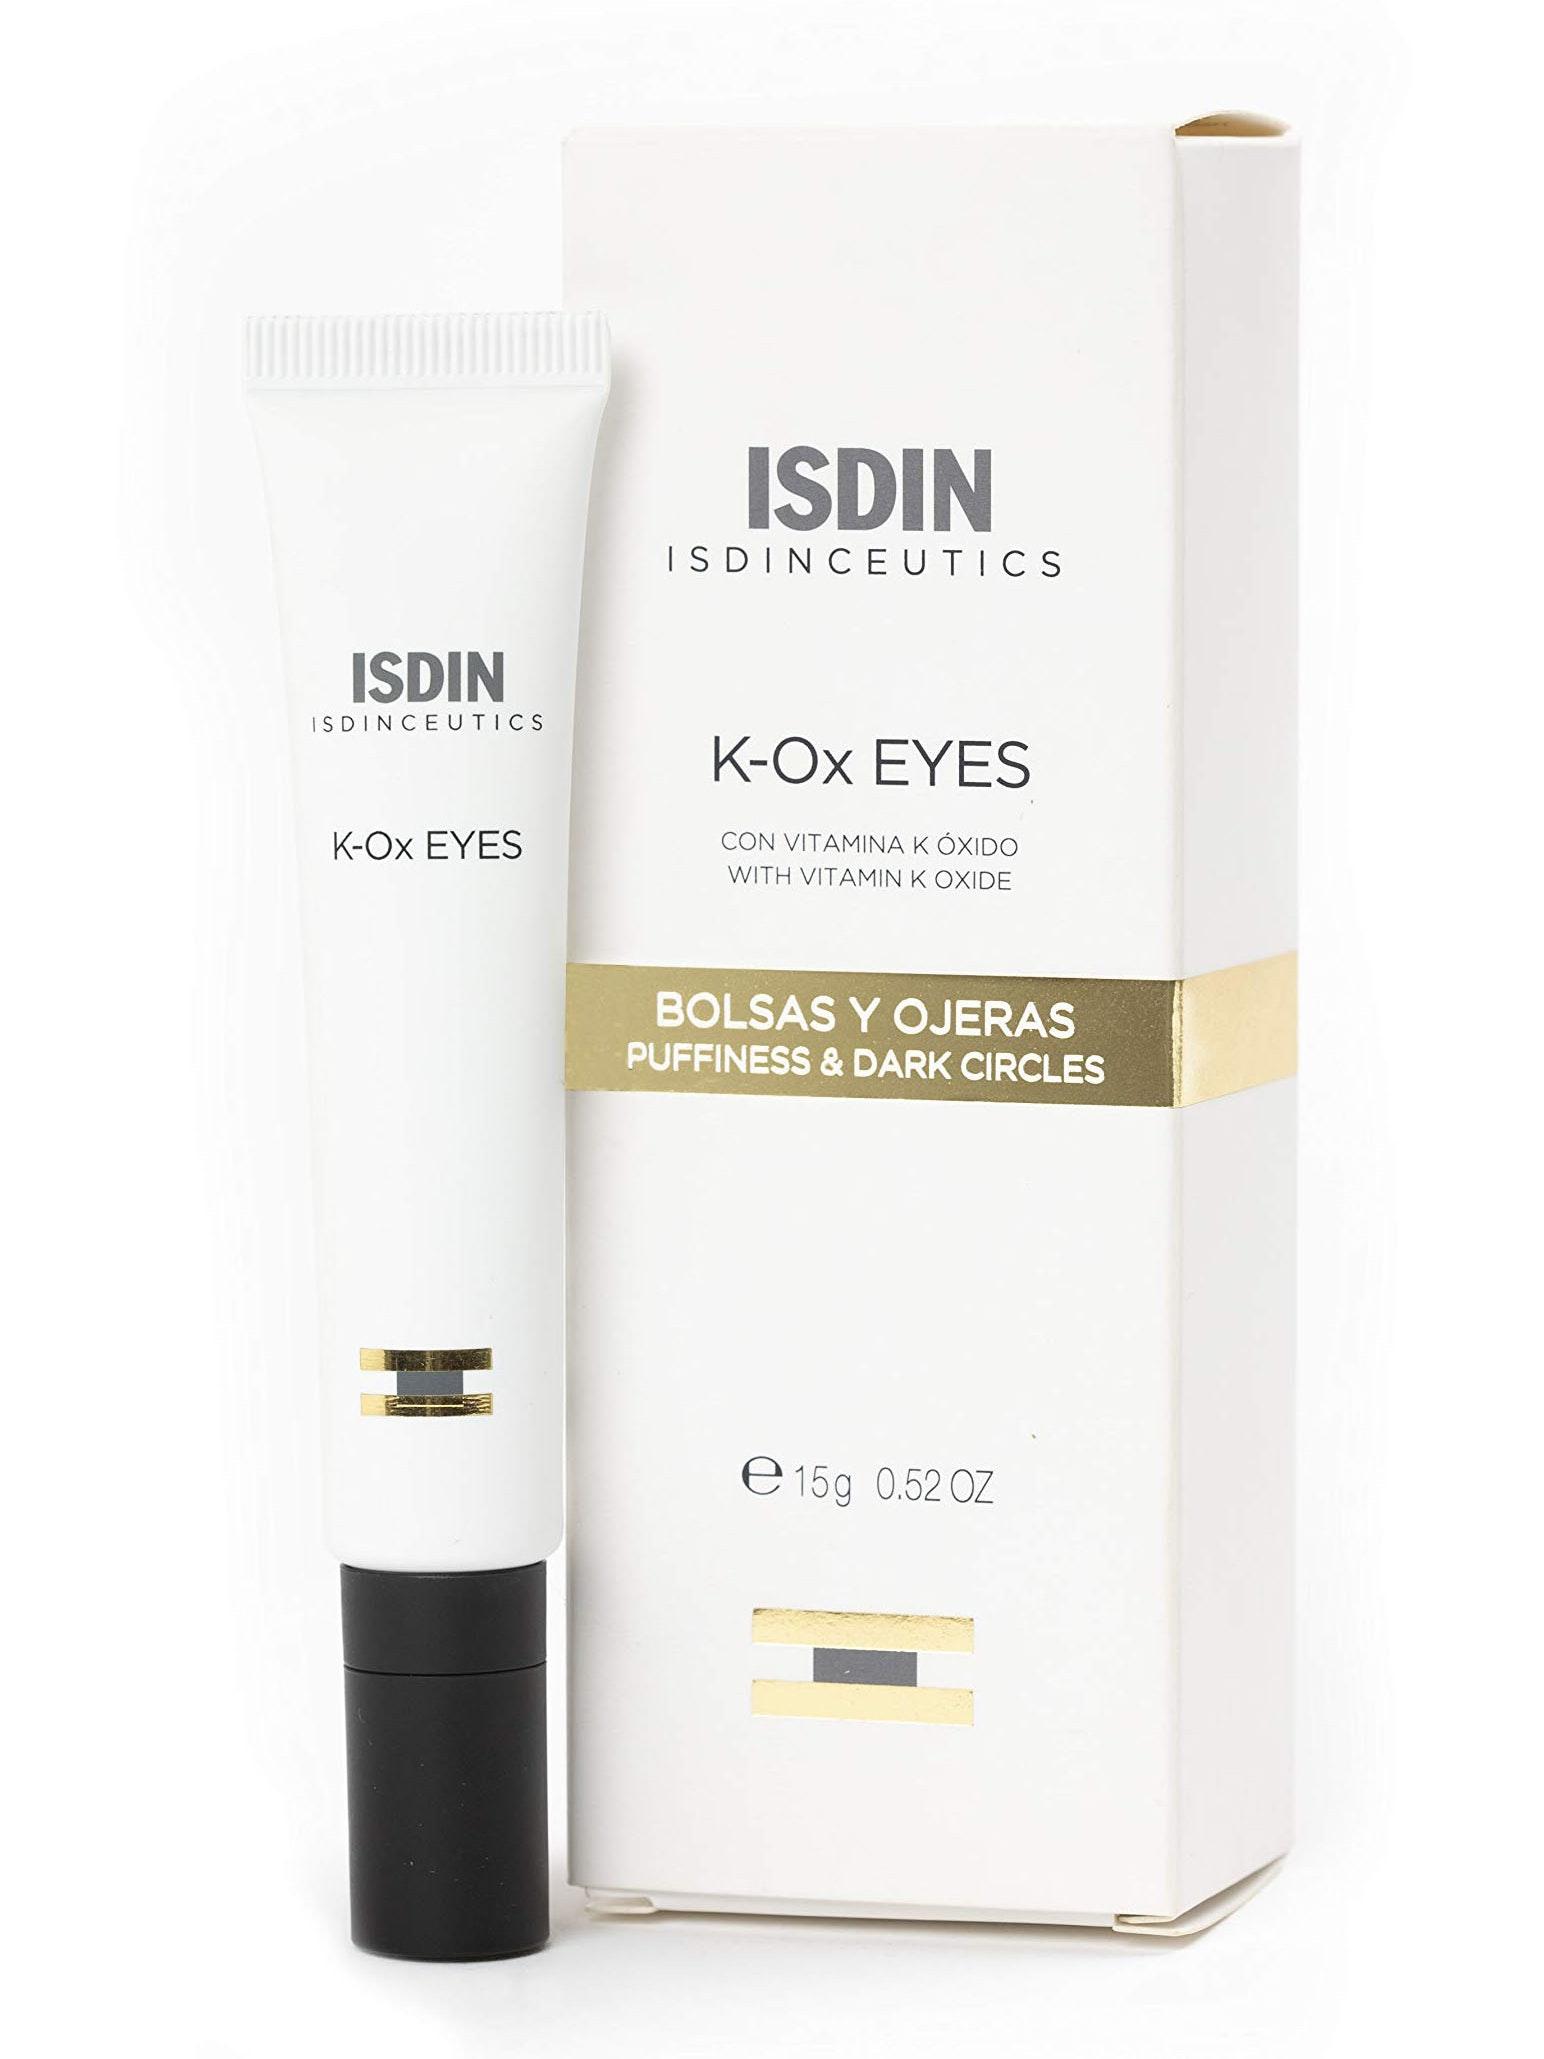 Isdinceutics K-Ox Eyes